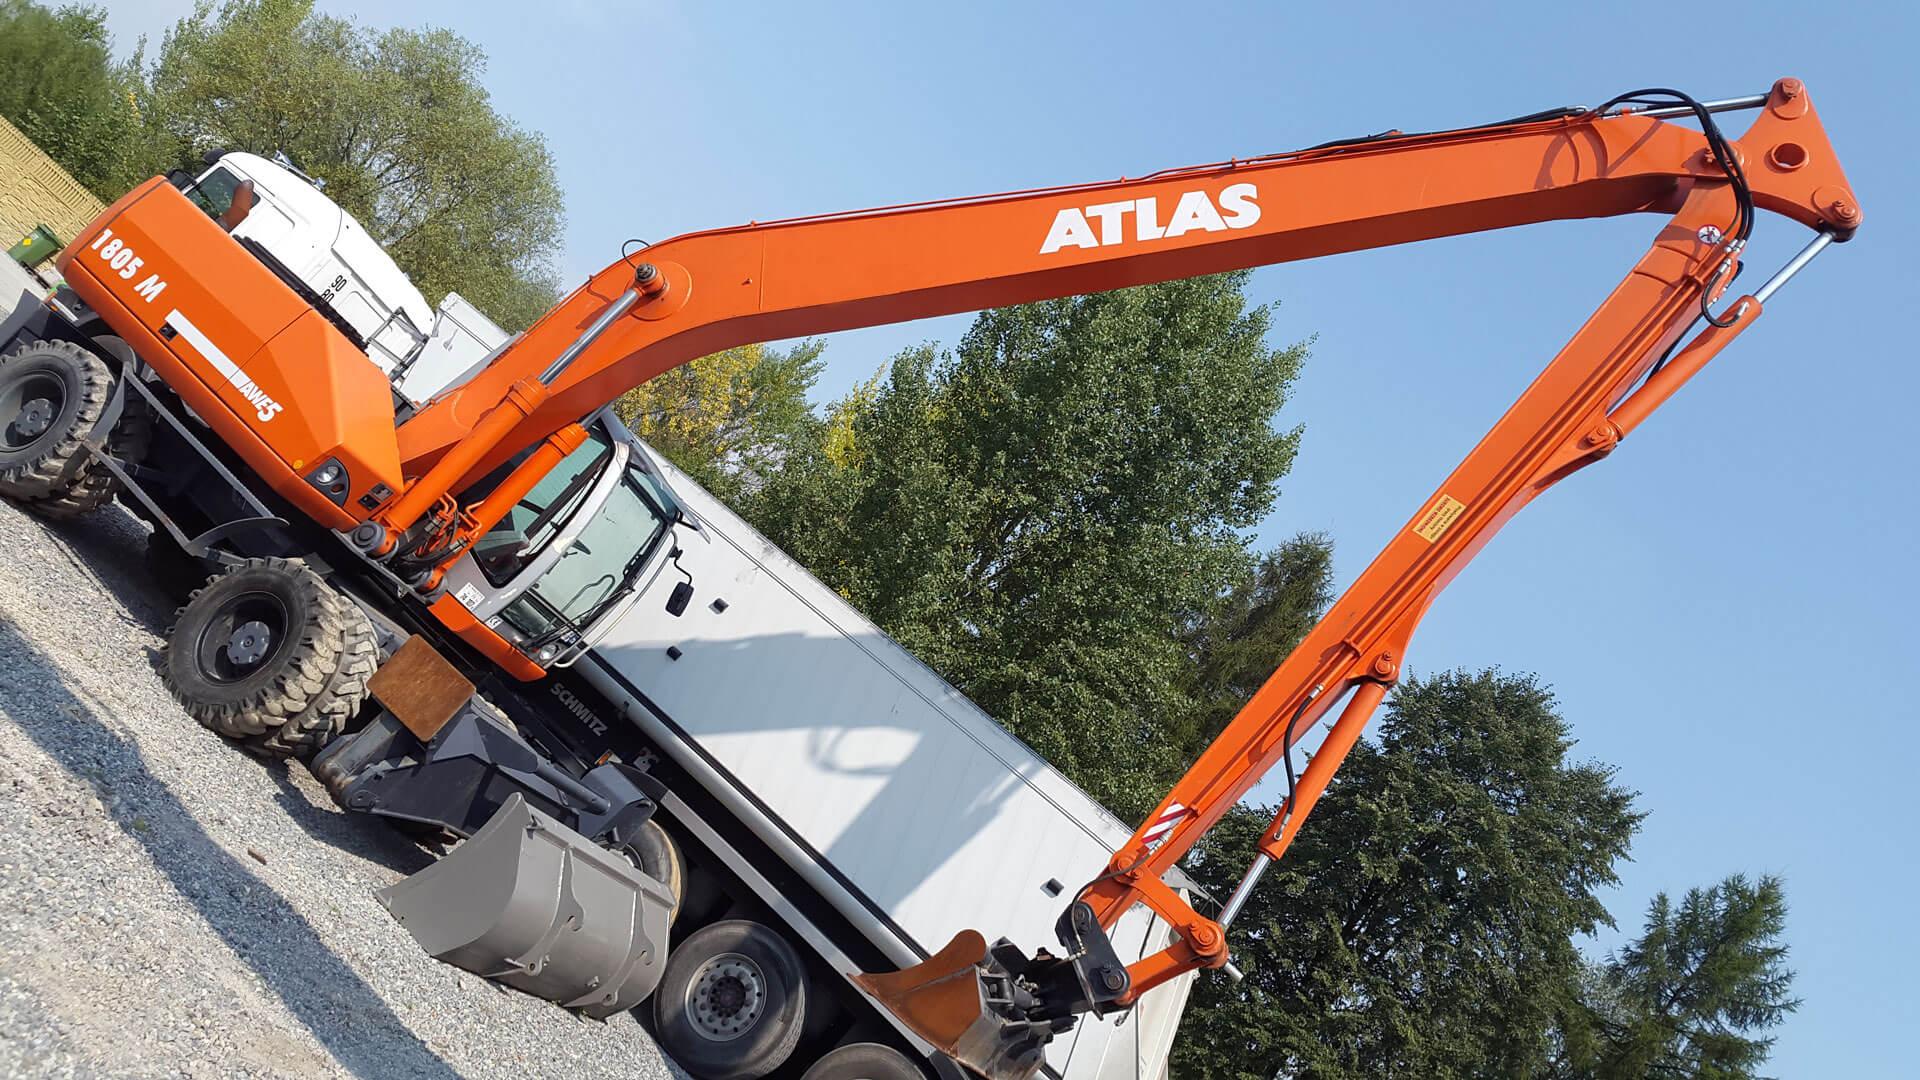 Atlas-Long-reach-1